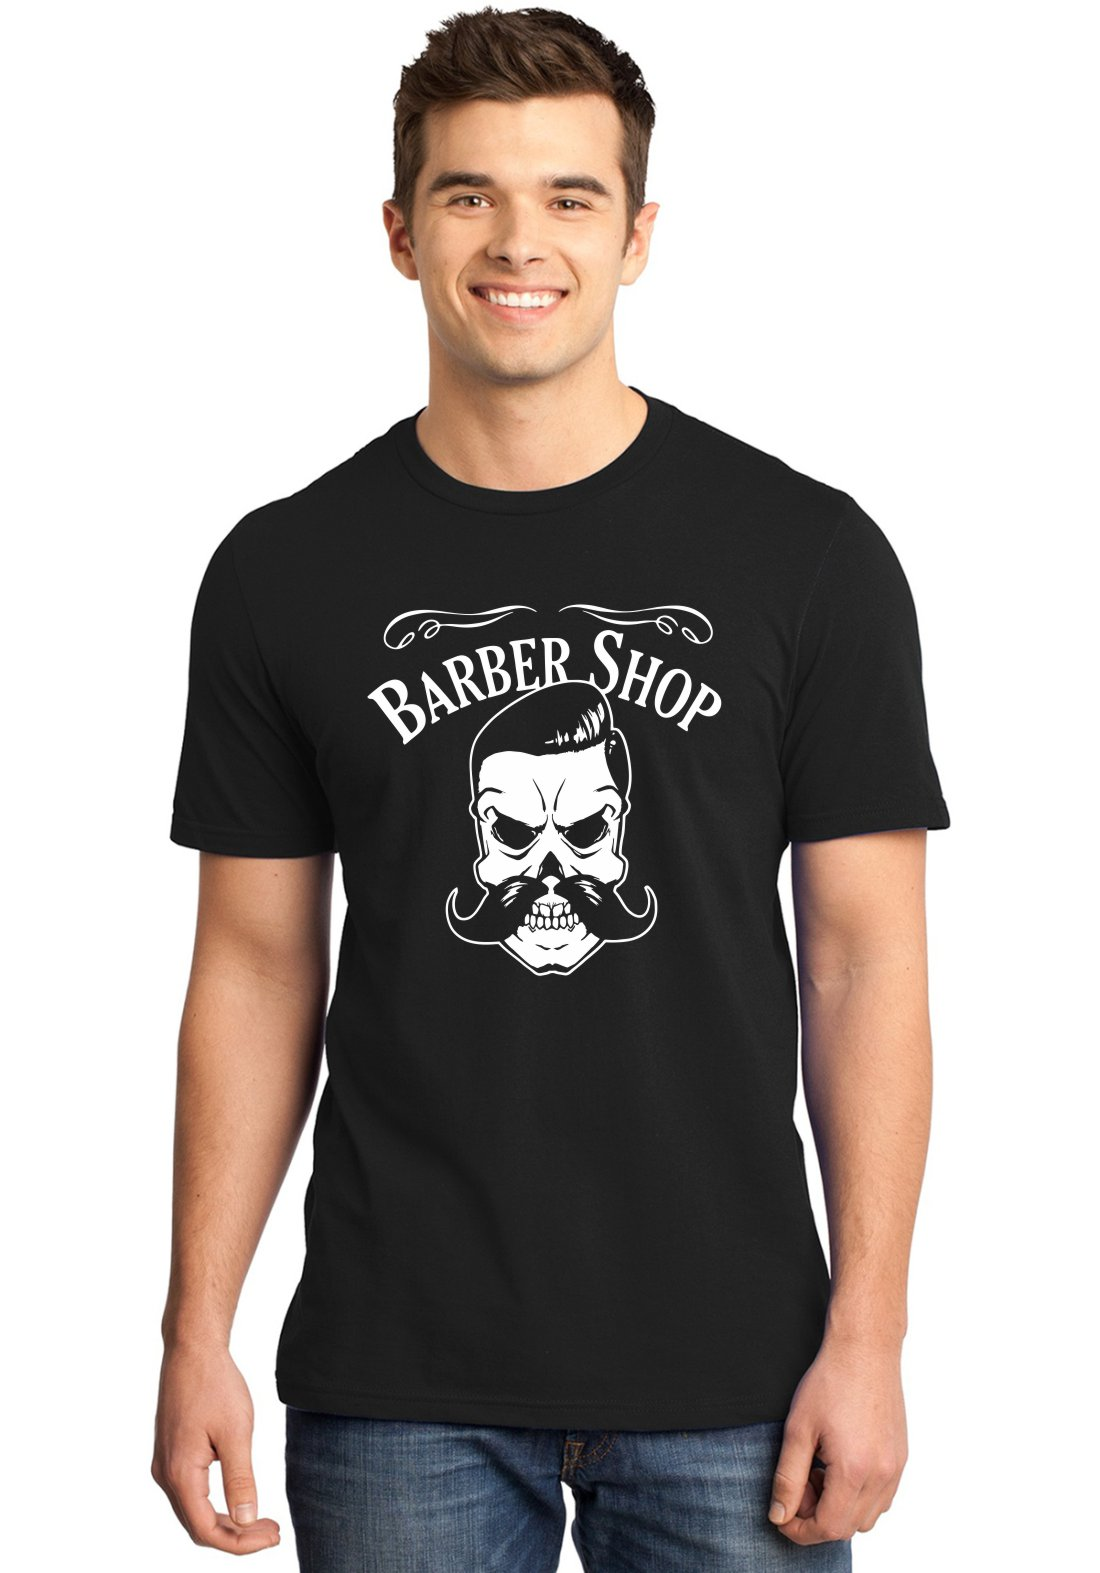 Camiseta Masculina Barbearia Clássica Barber Shop Caveira ER_158